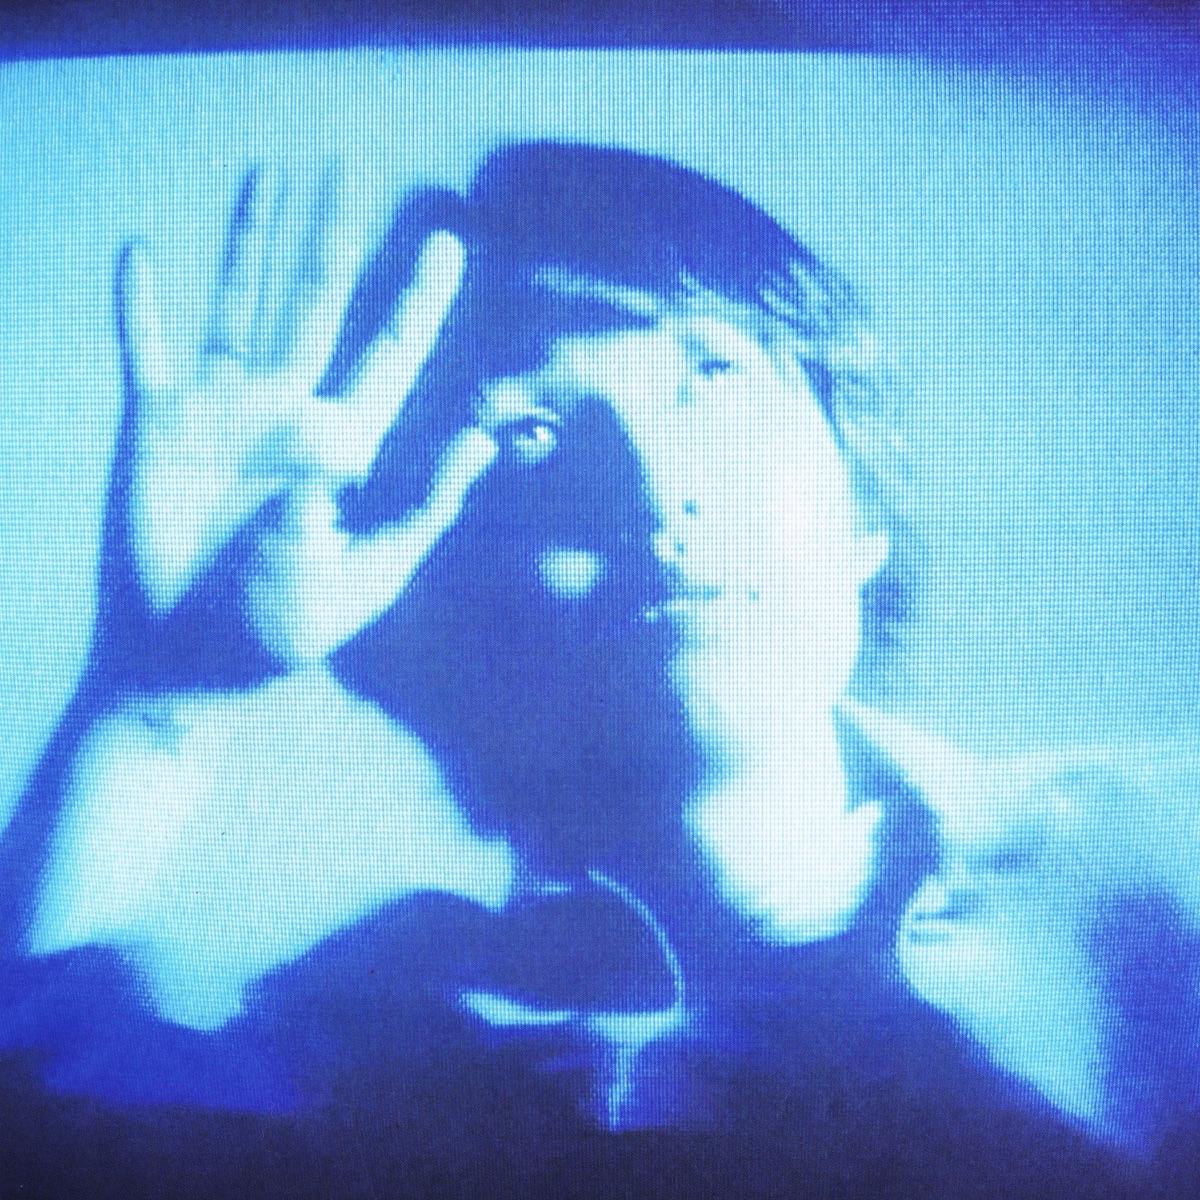 『Mega Shinnosuke - Midnight Routine』収録の『Midnight Routine』ジャケット